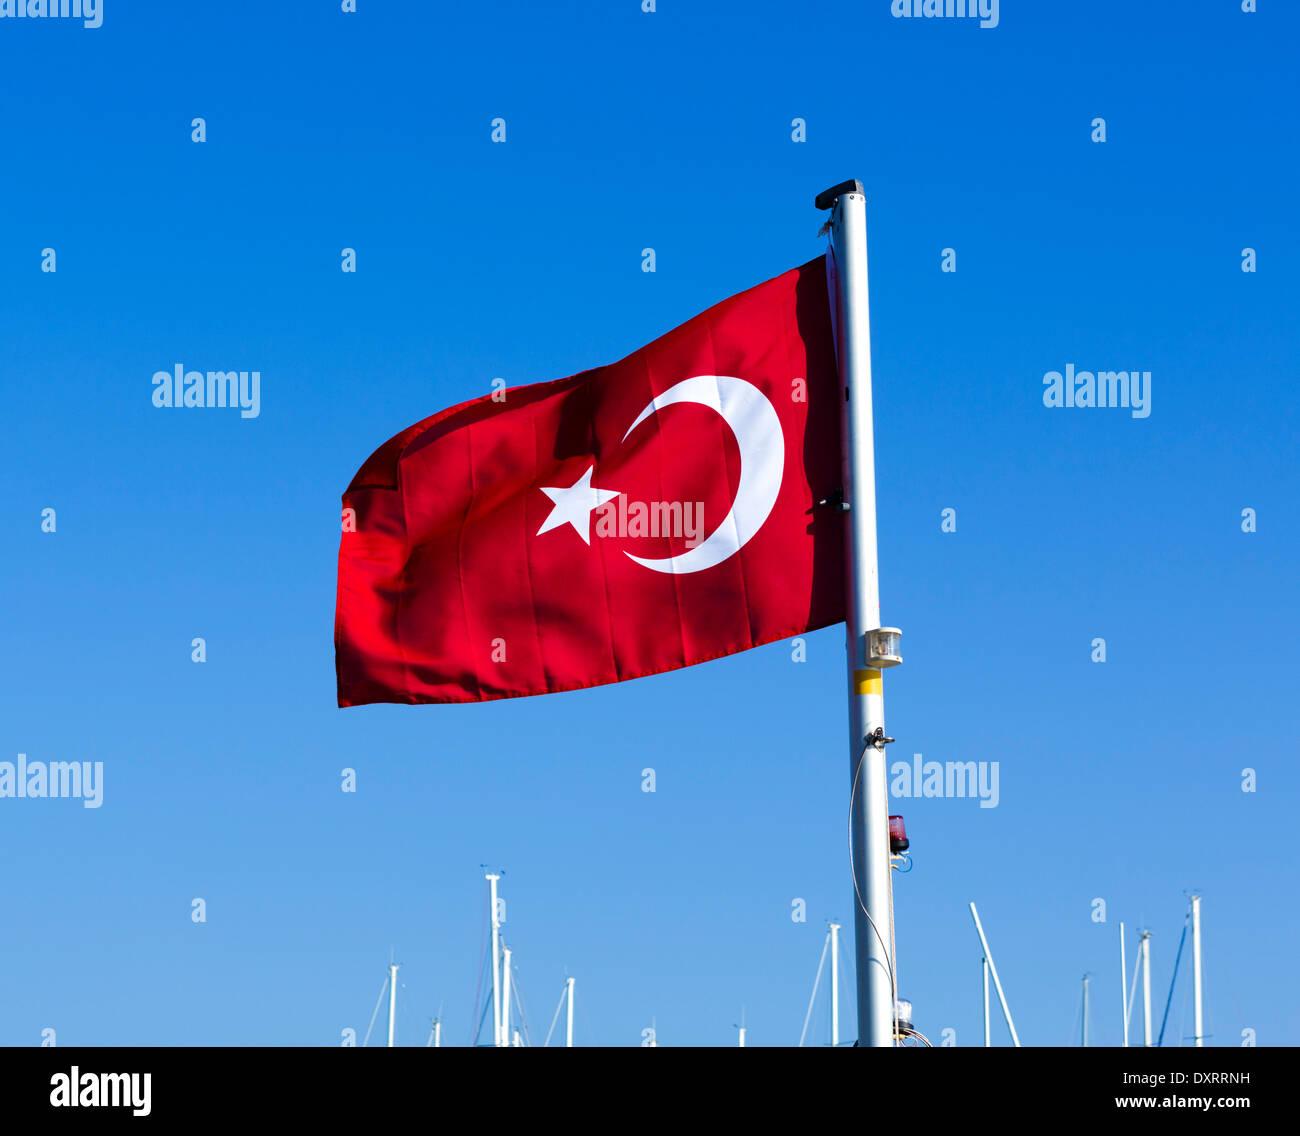 Turkish flag flying on a boat in the harbour at Ucagiz near Kekova Island, Turquoise Coast, Antalya Province, Turkey - Stock Image